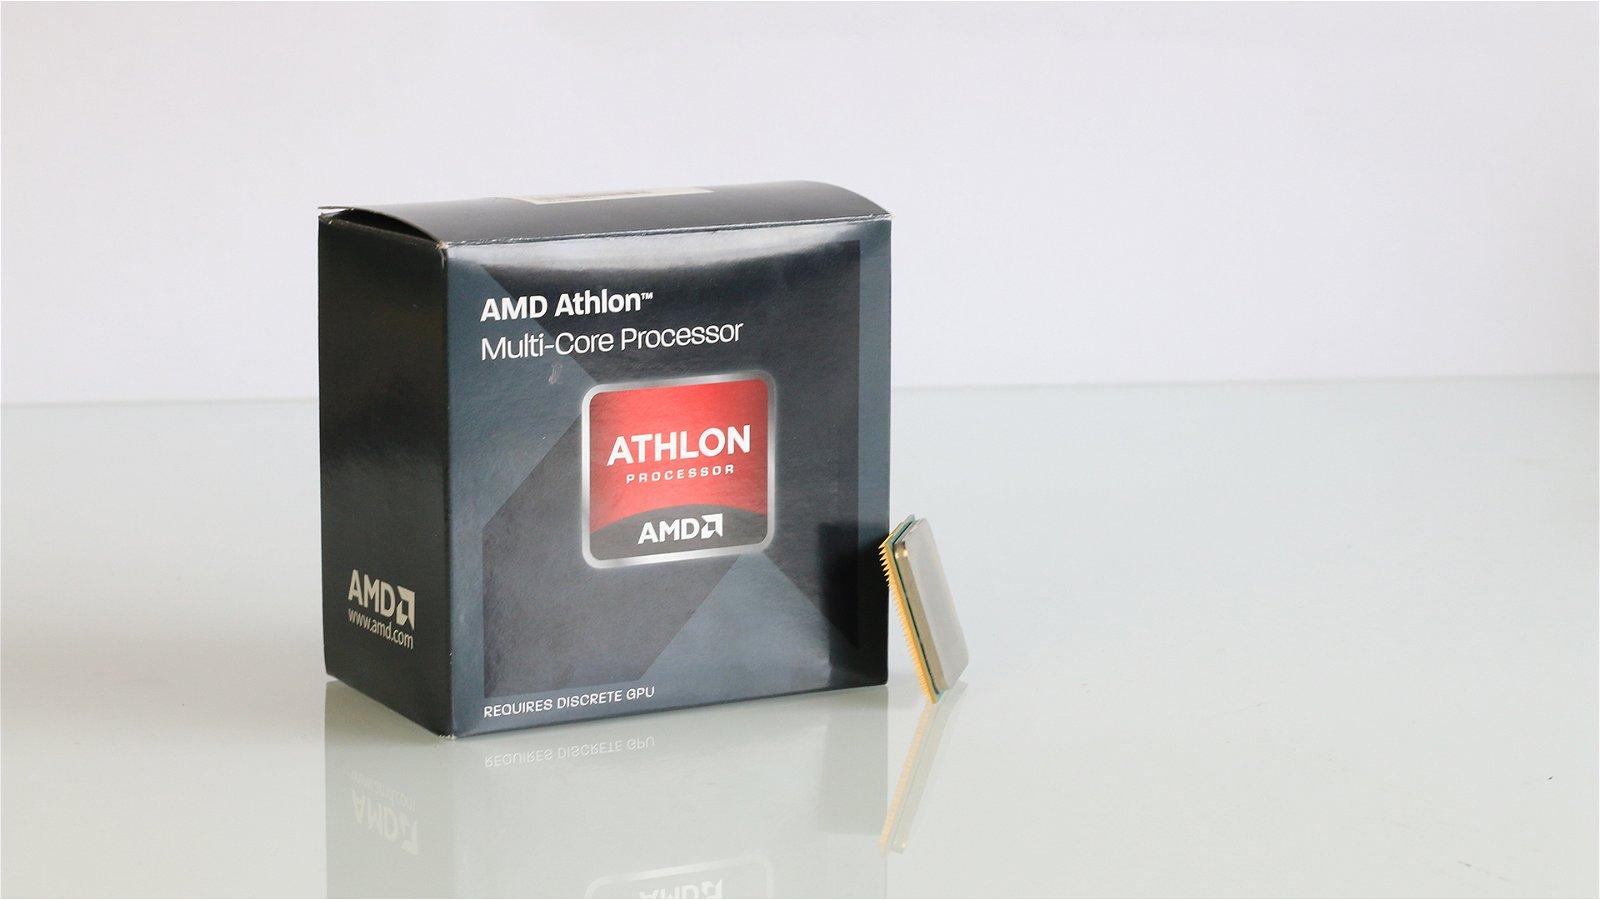 AMD Athlon X4-845 Quad-Core Processor Review 2